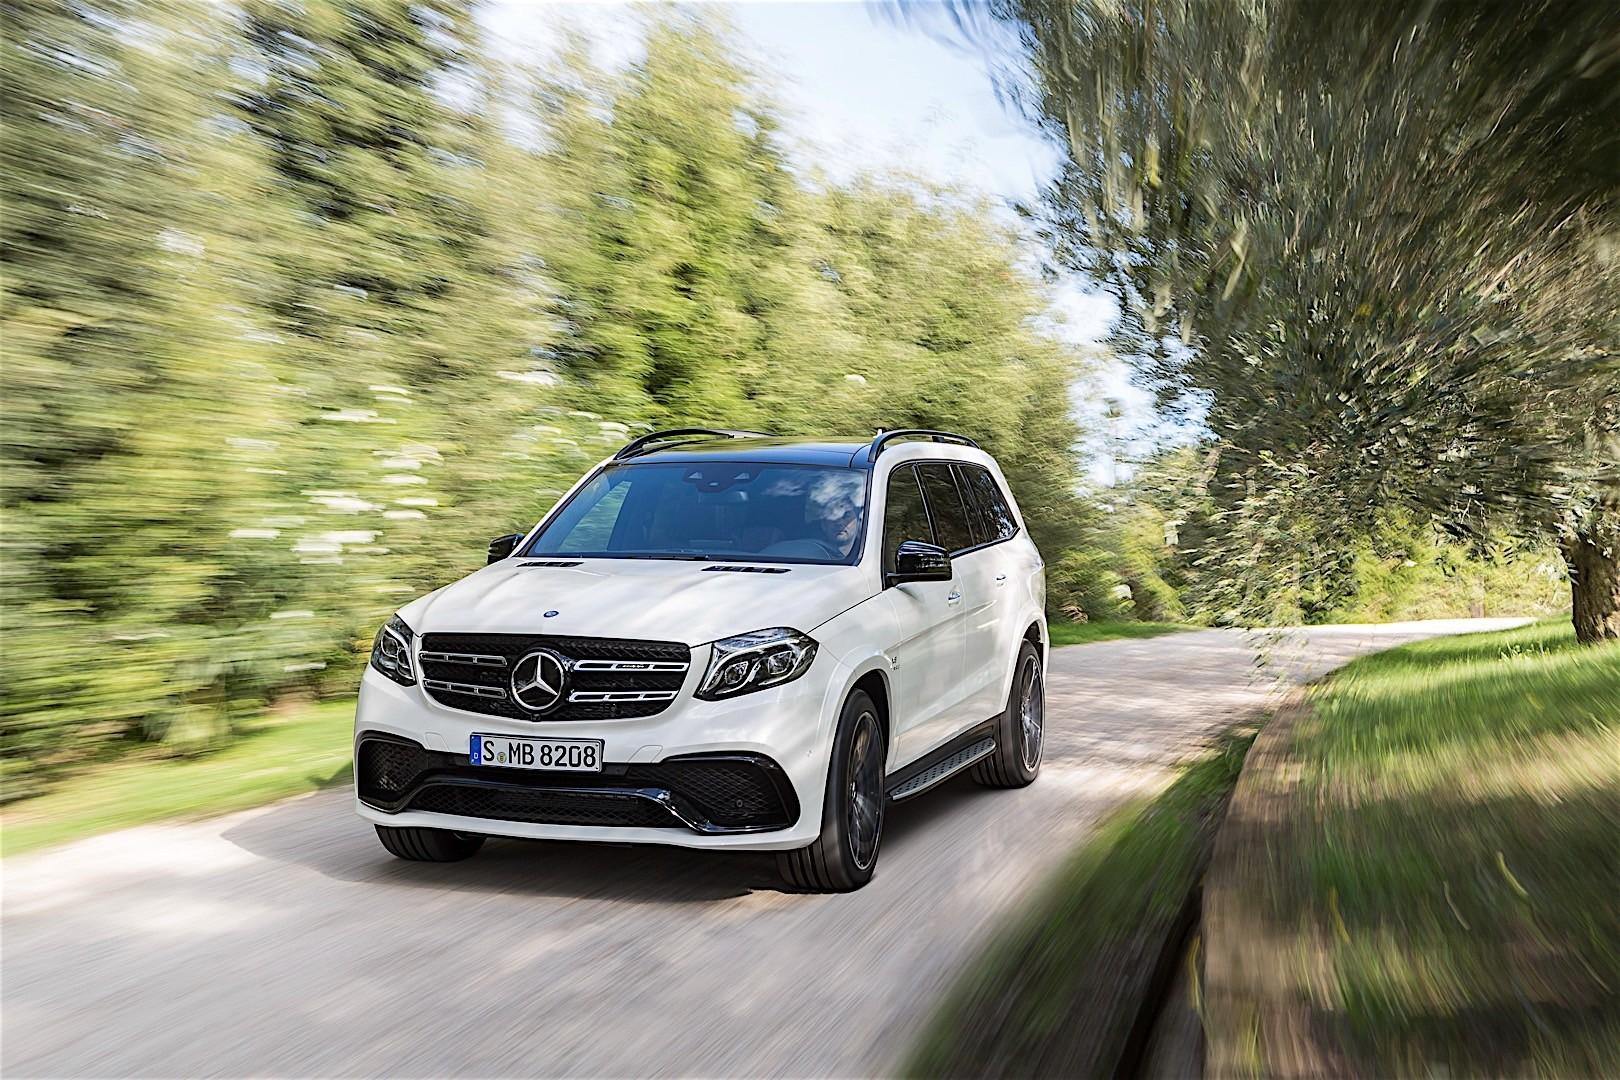 Mercedes benz gls 63 amg x166 2016 autoevolution for Mercedes benz gls suv